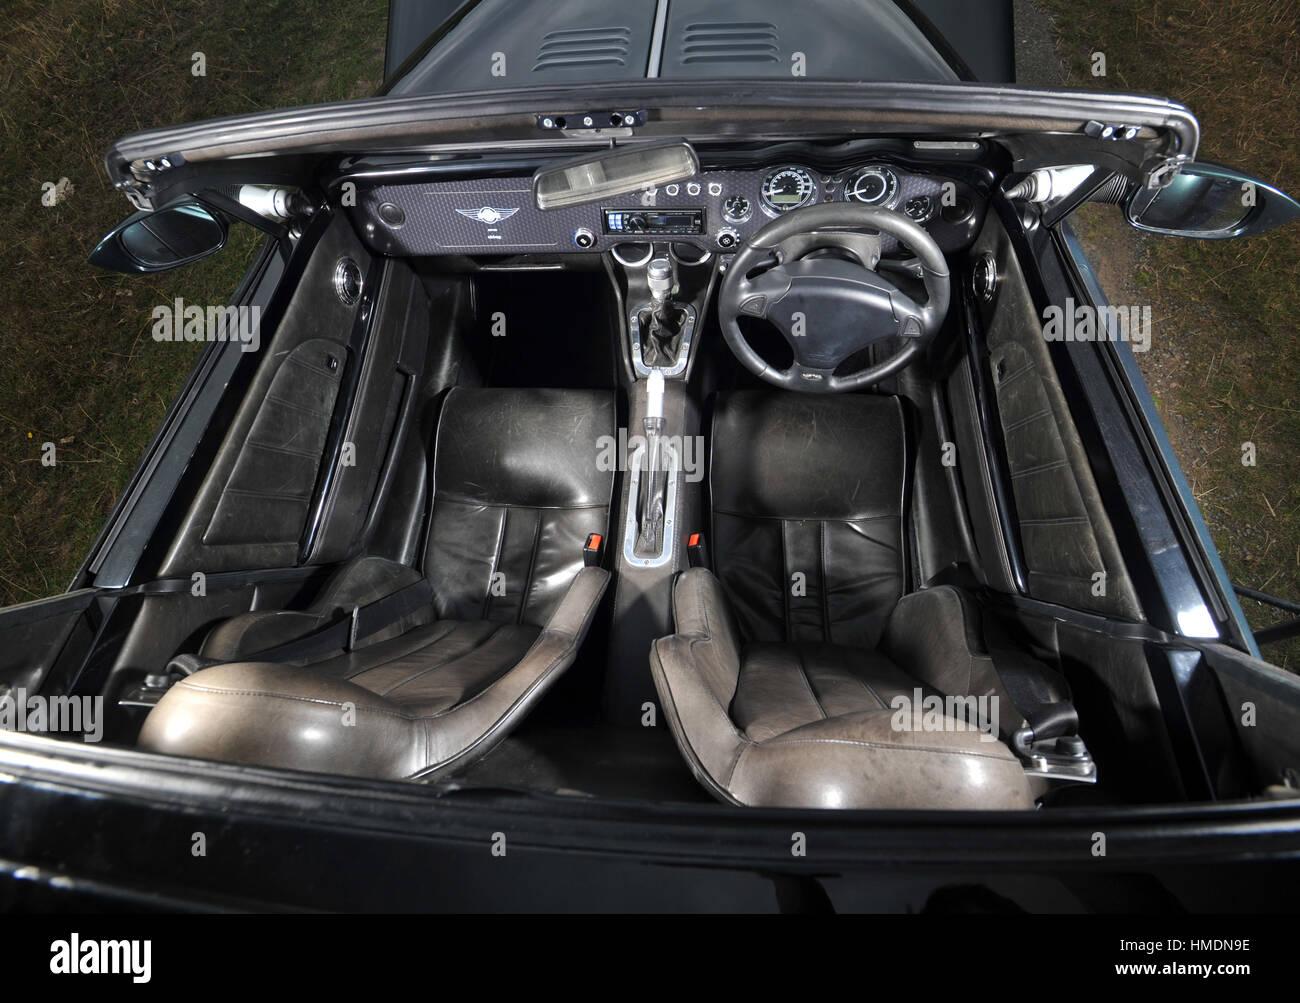 2010 Morgan Aero retro styled British V8 sports car interior - Stock Image